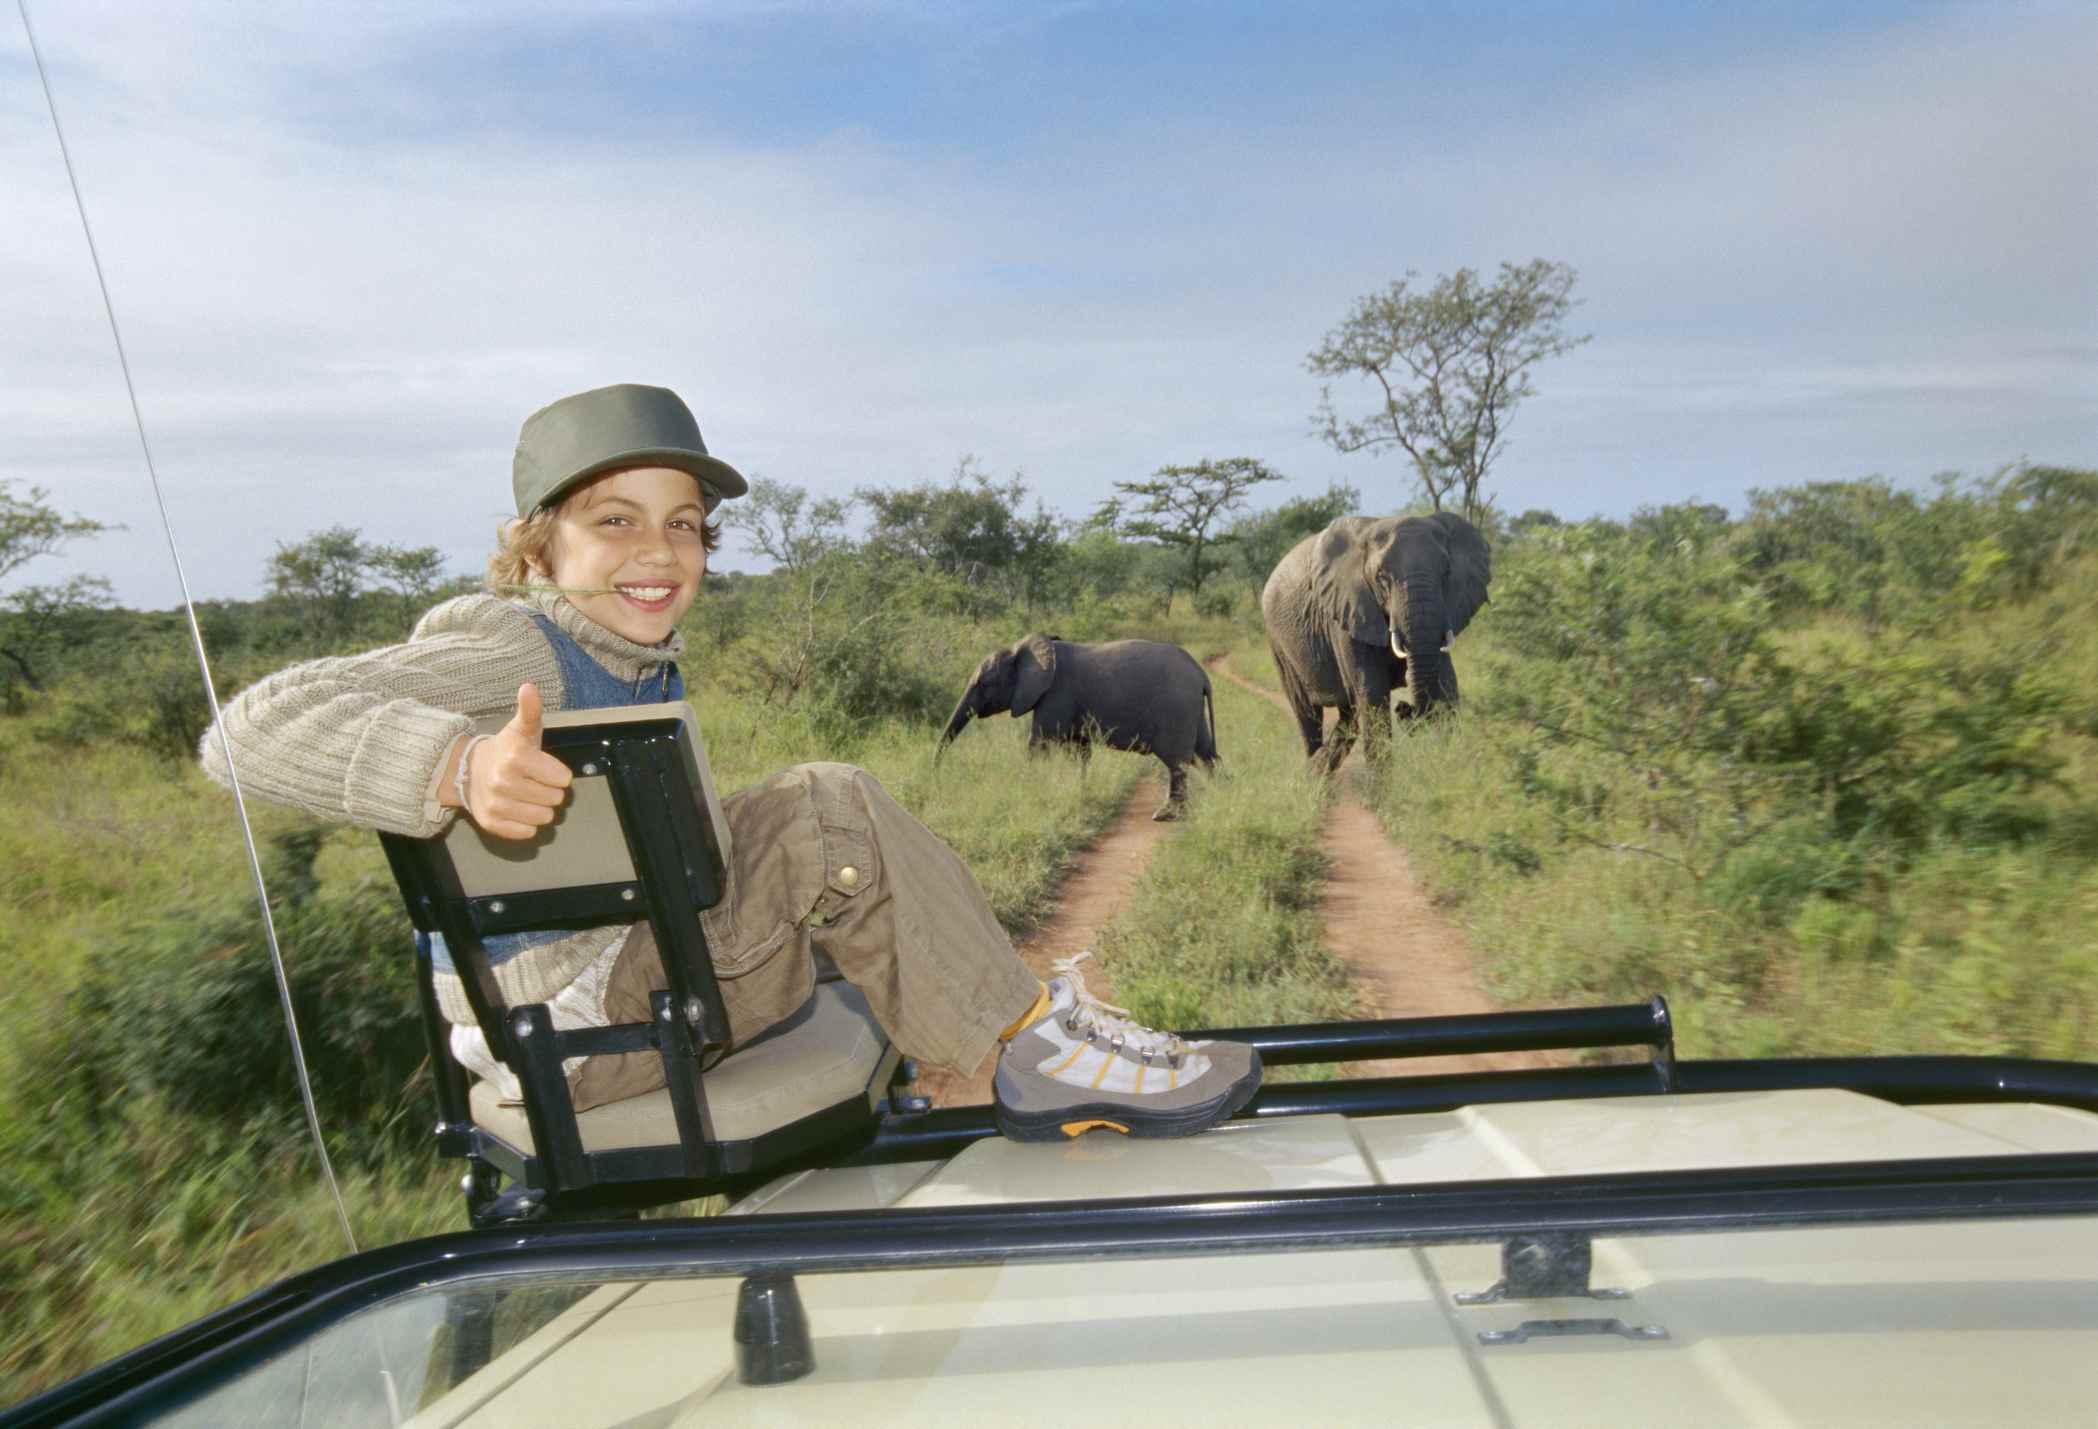 Young Boy with elephants on safari